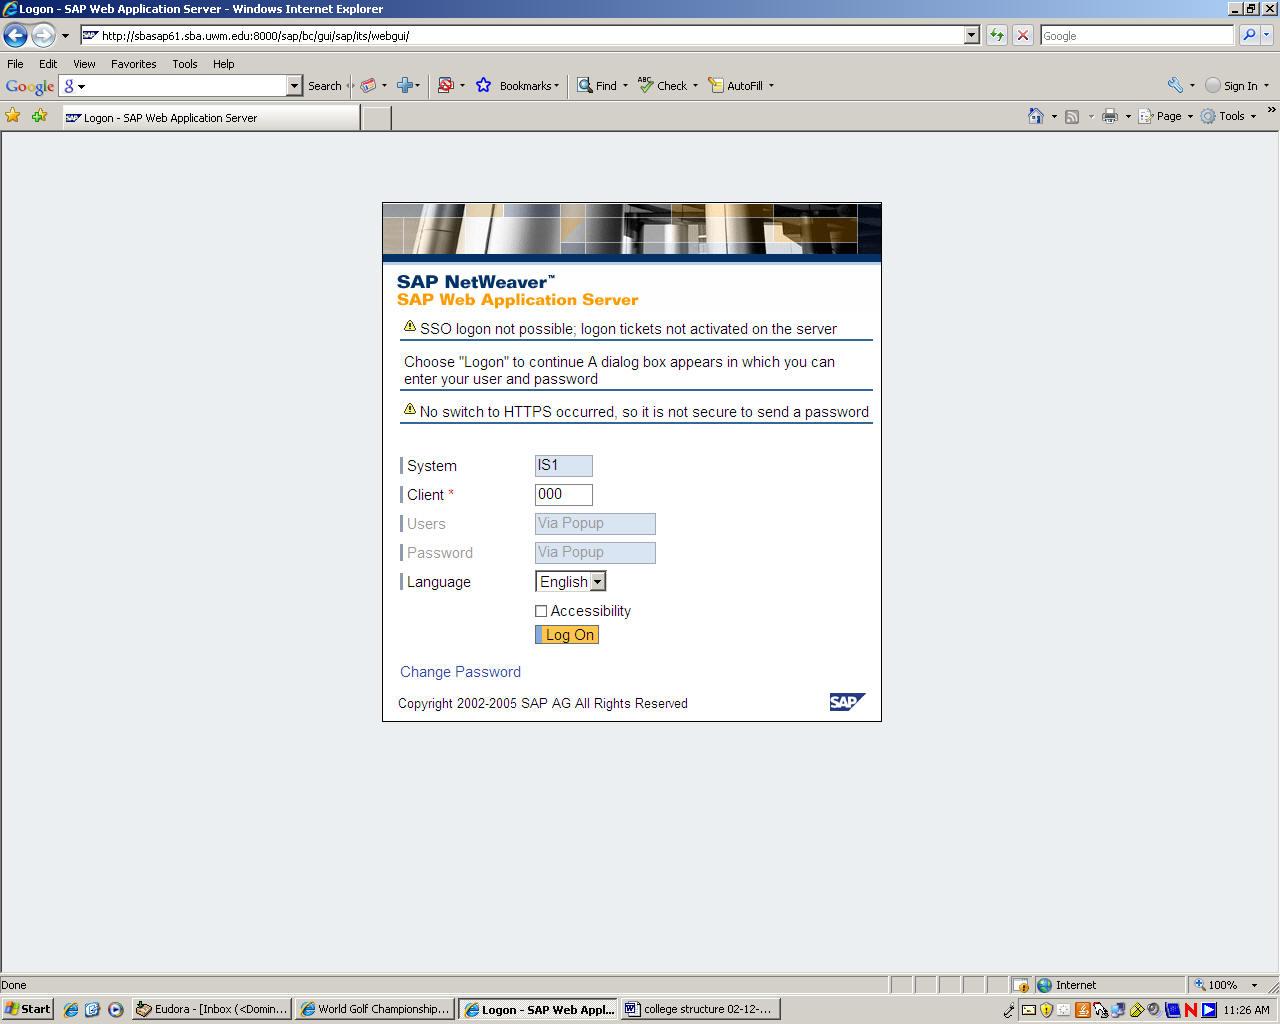 A Quick Tour of SAP